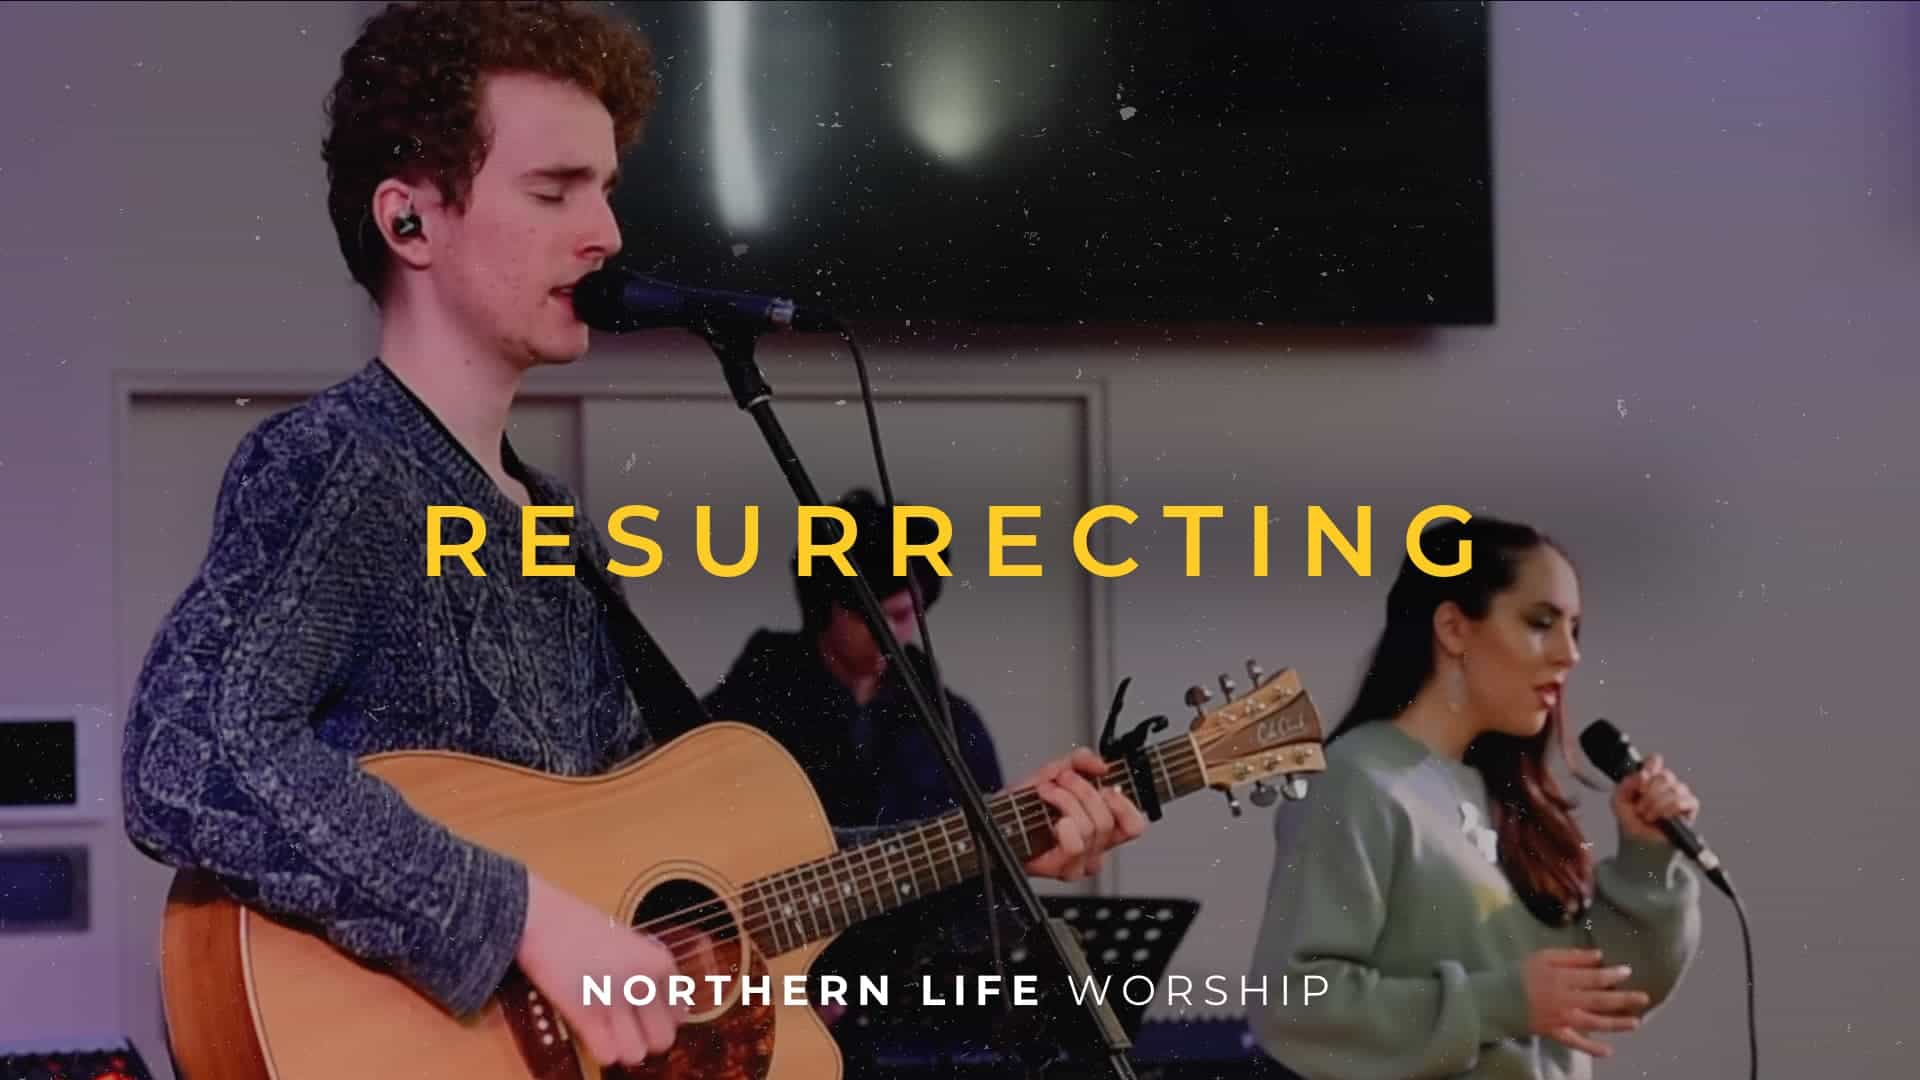 Resurrecting